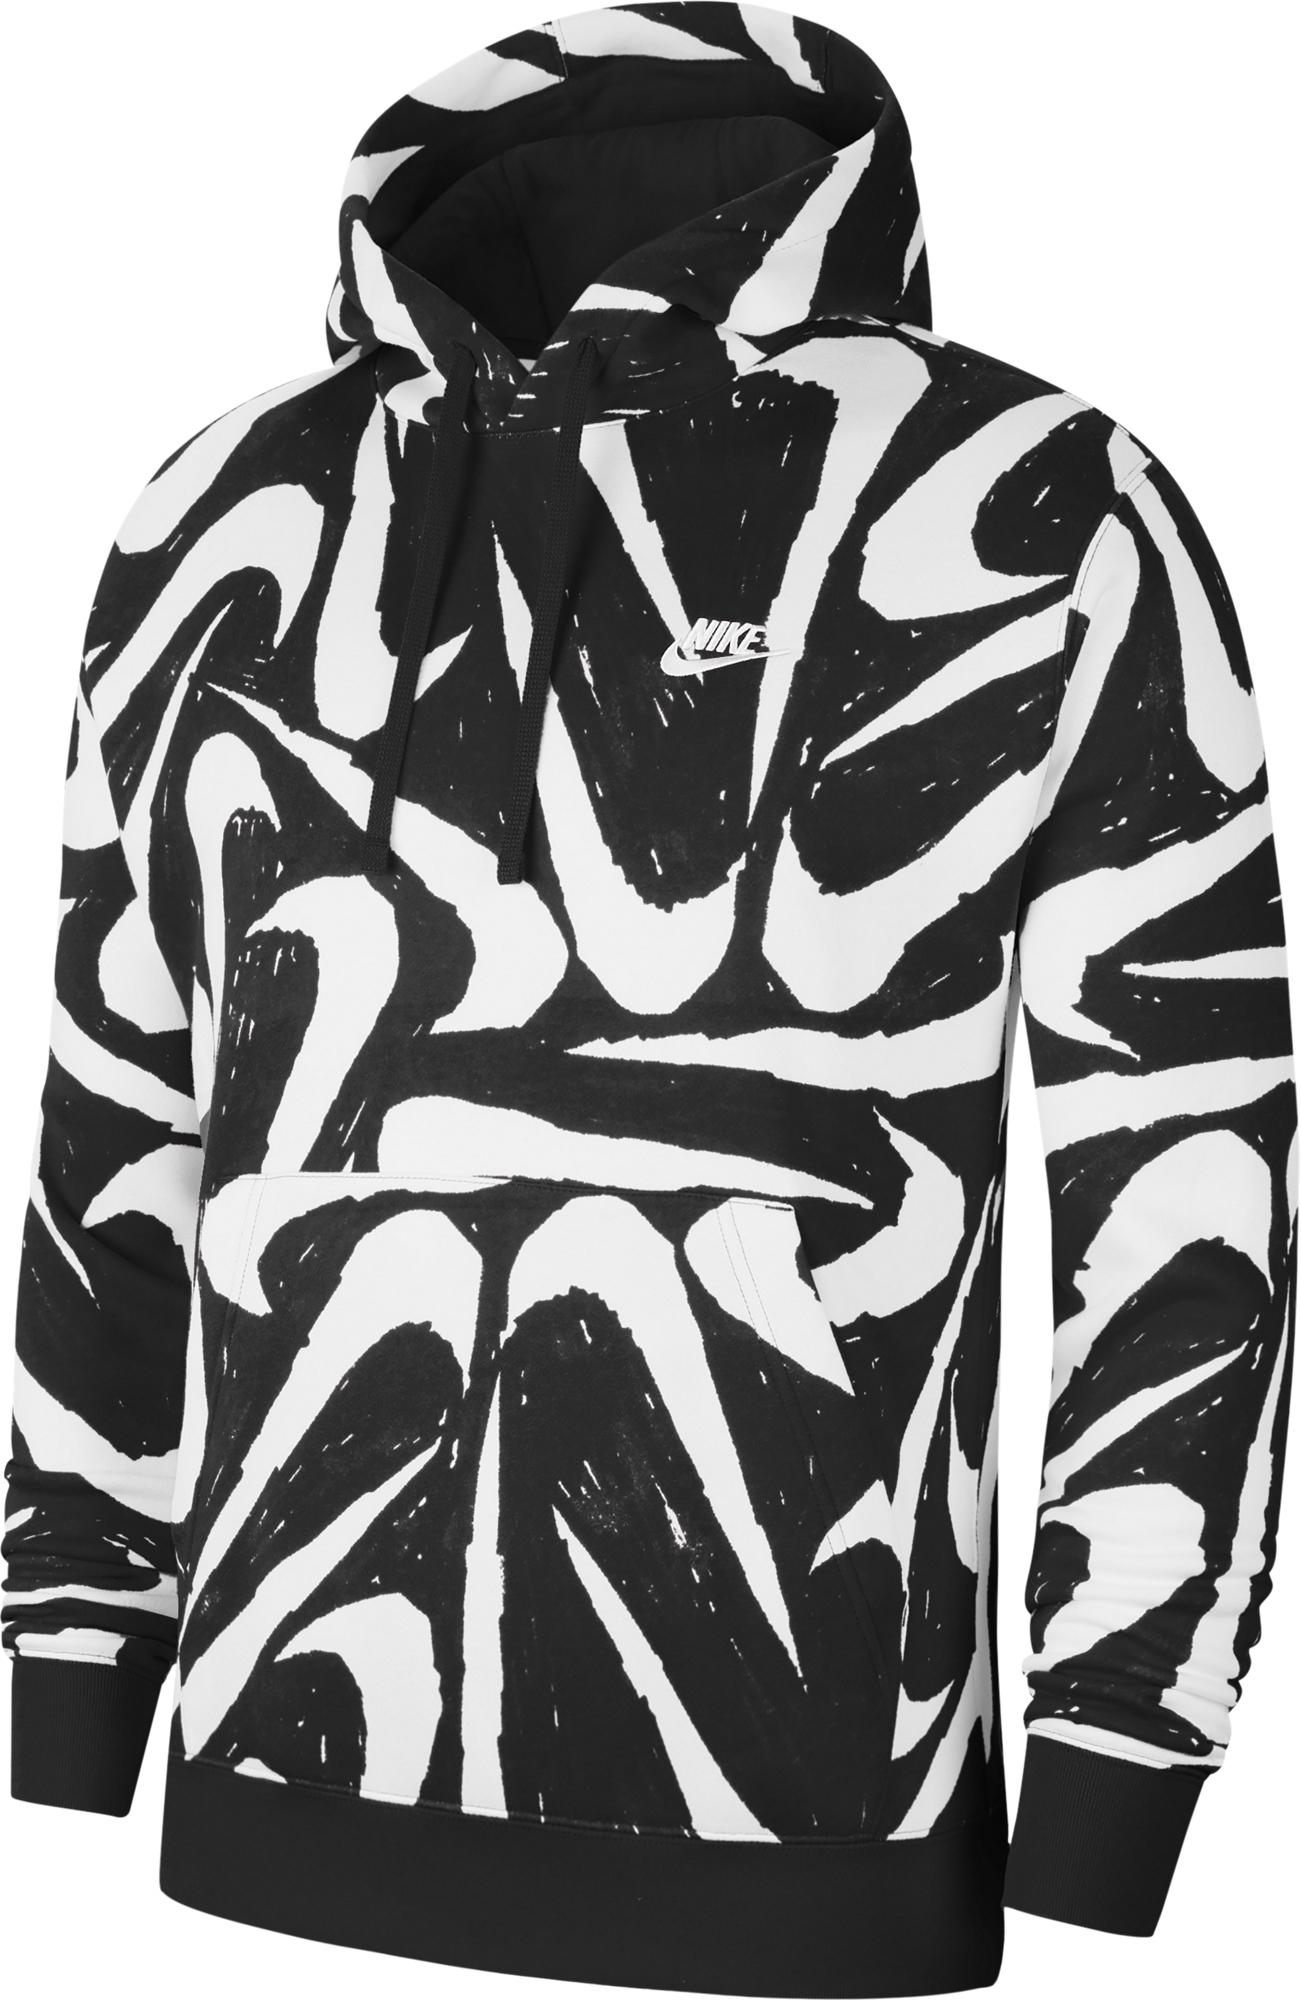 Nike Худи мужская Nike Sportswear Club, размер 52-54 худи superdry оранжевый 54 размер